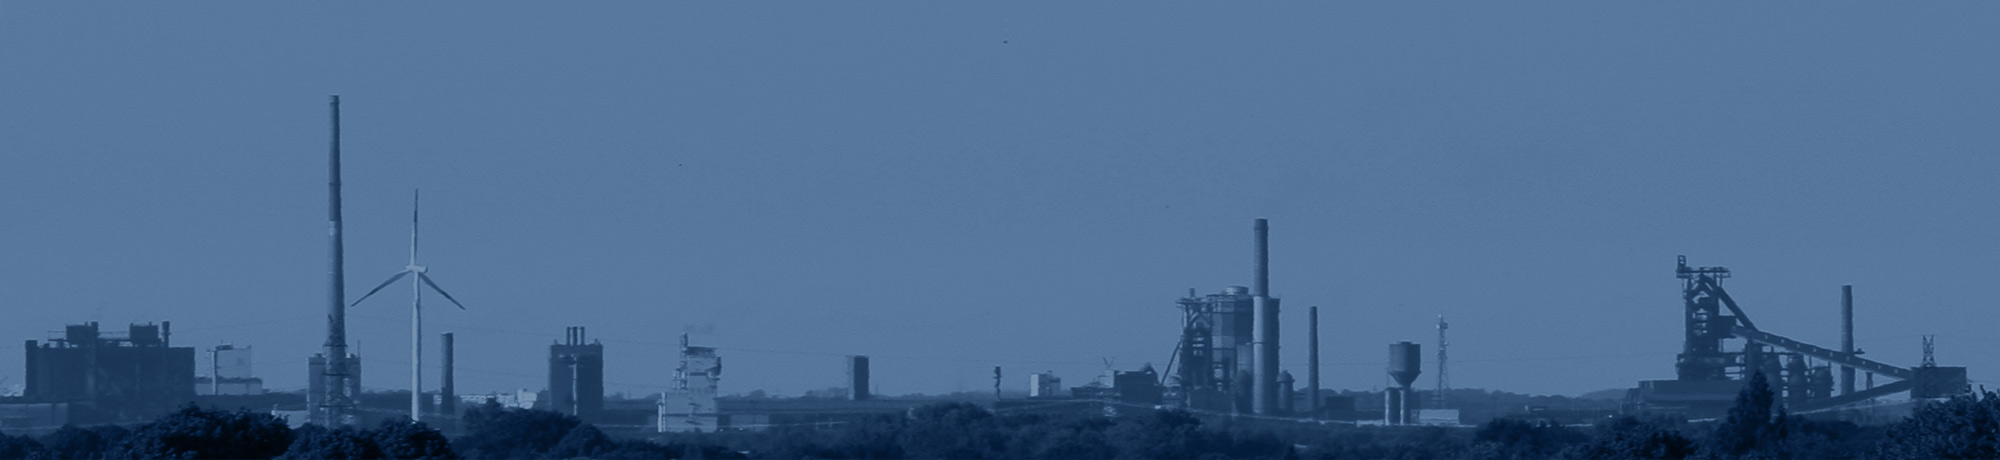 slider-skyline